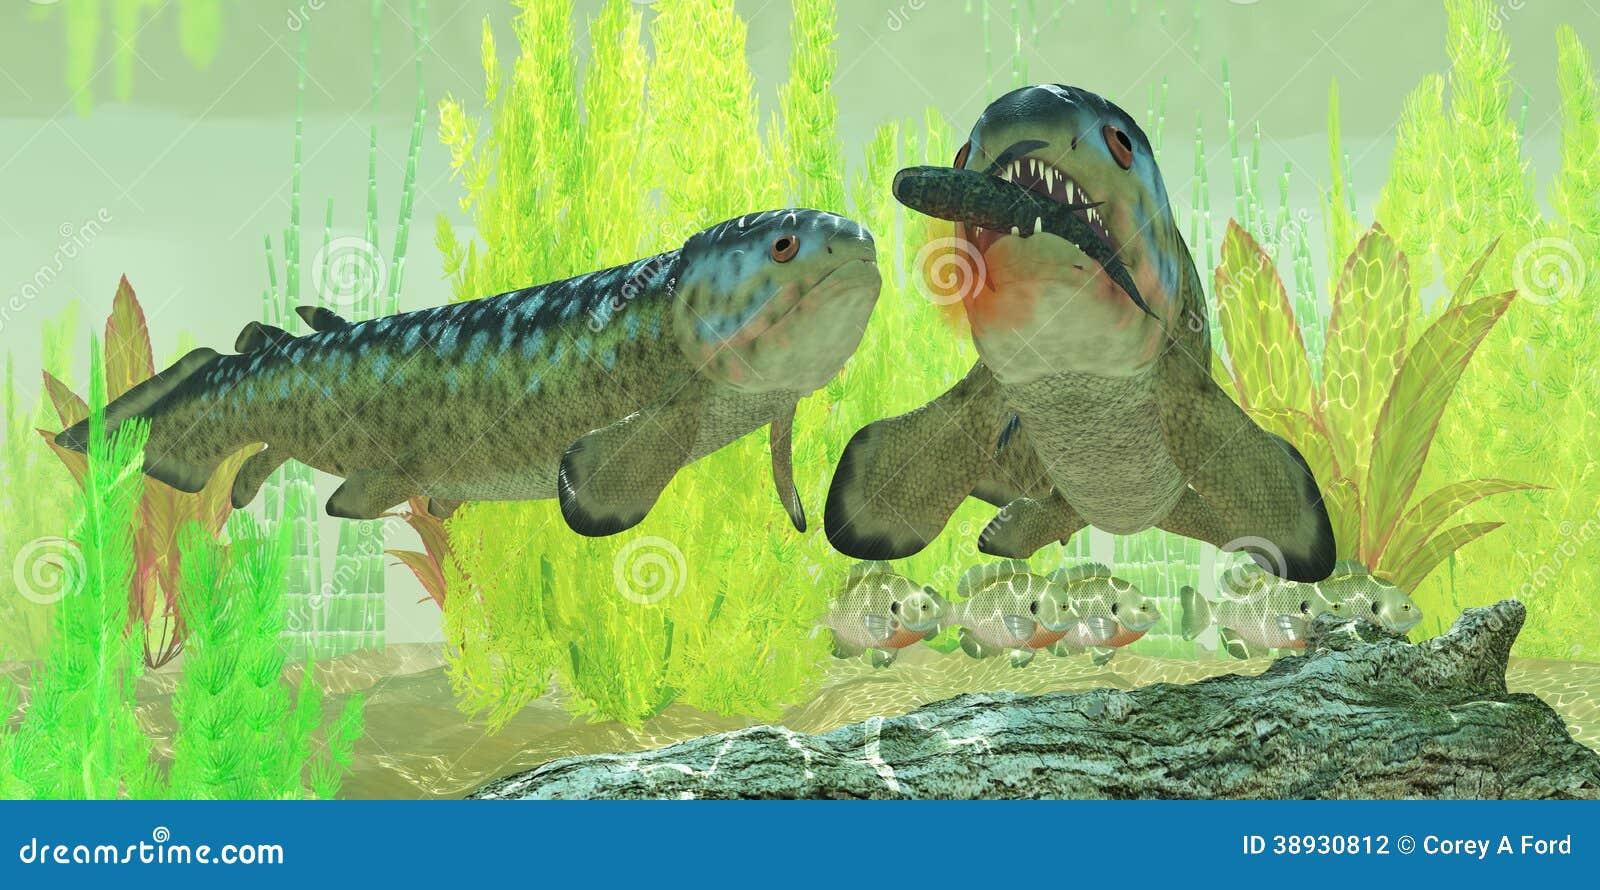 Carboniferous rhizodus fish stock illustration image for Predatory freshwater fish